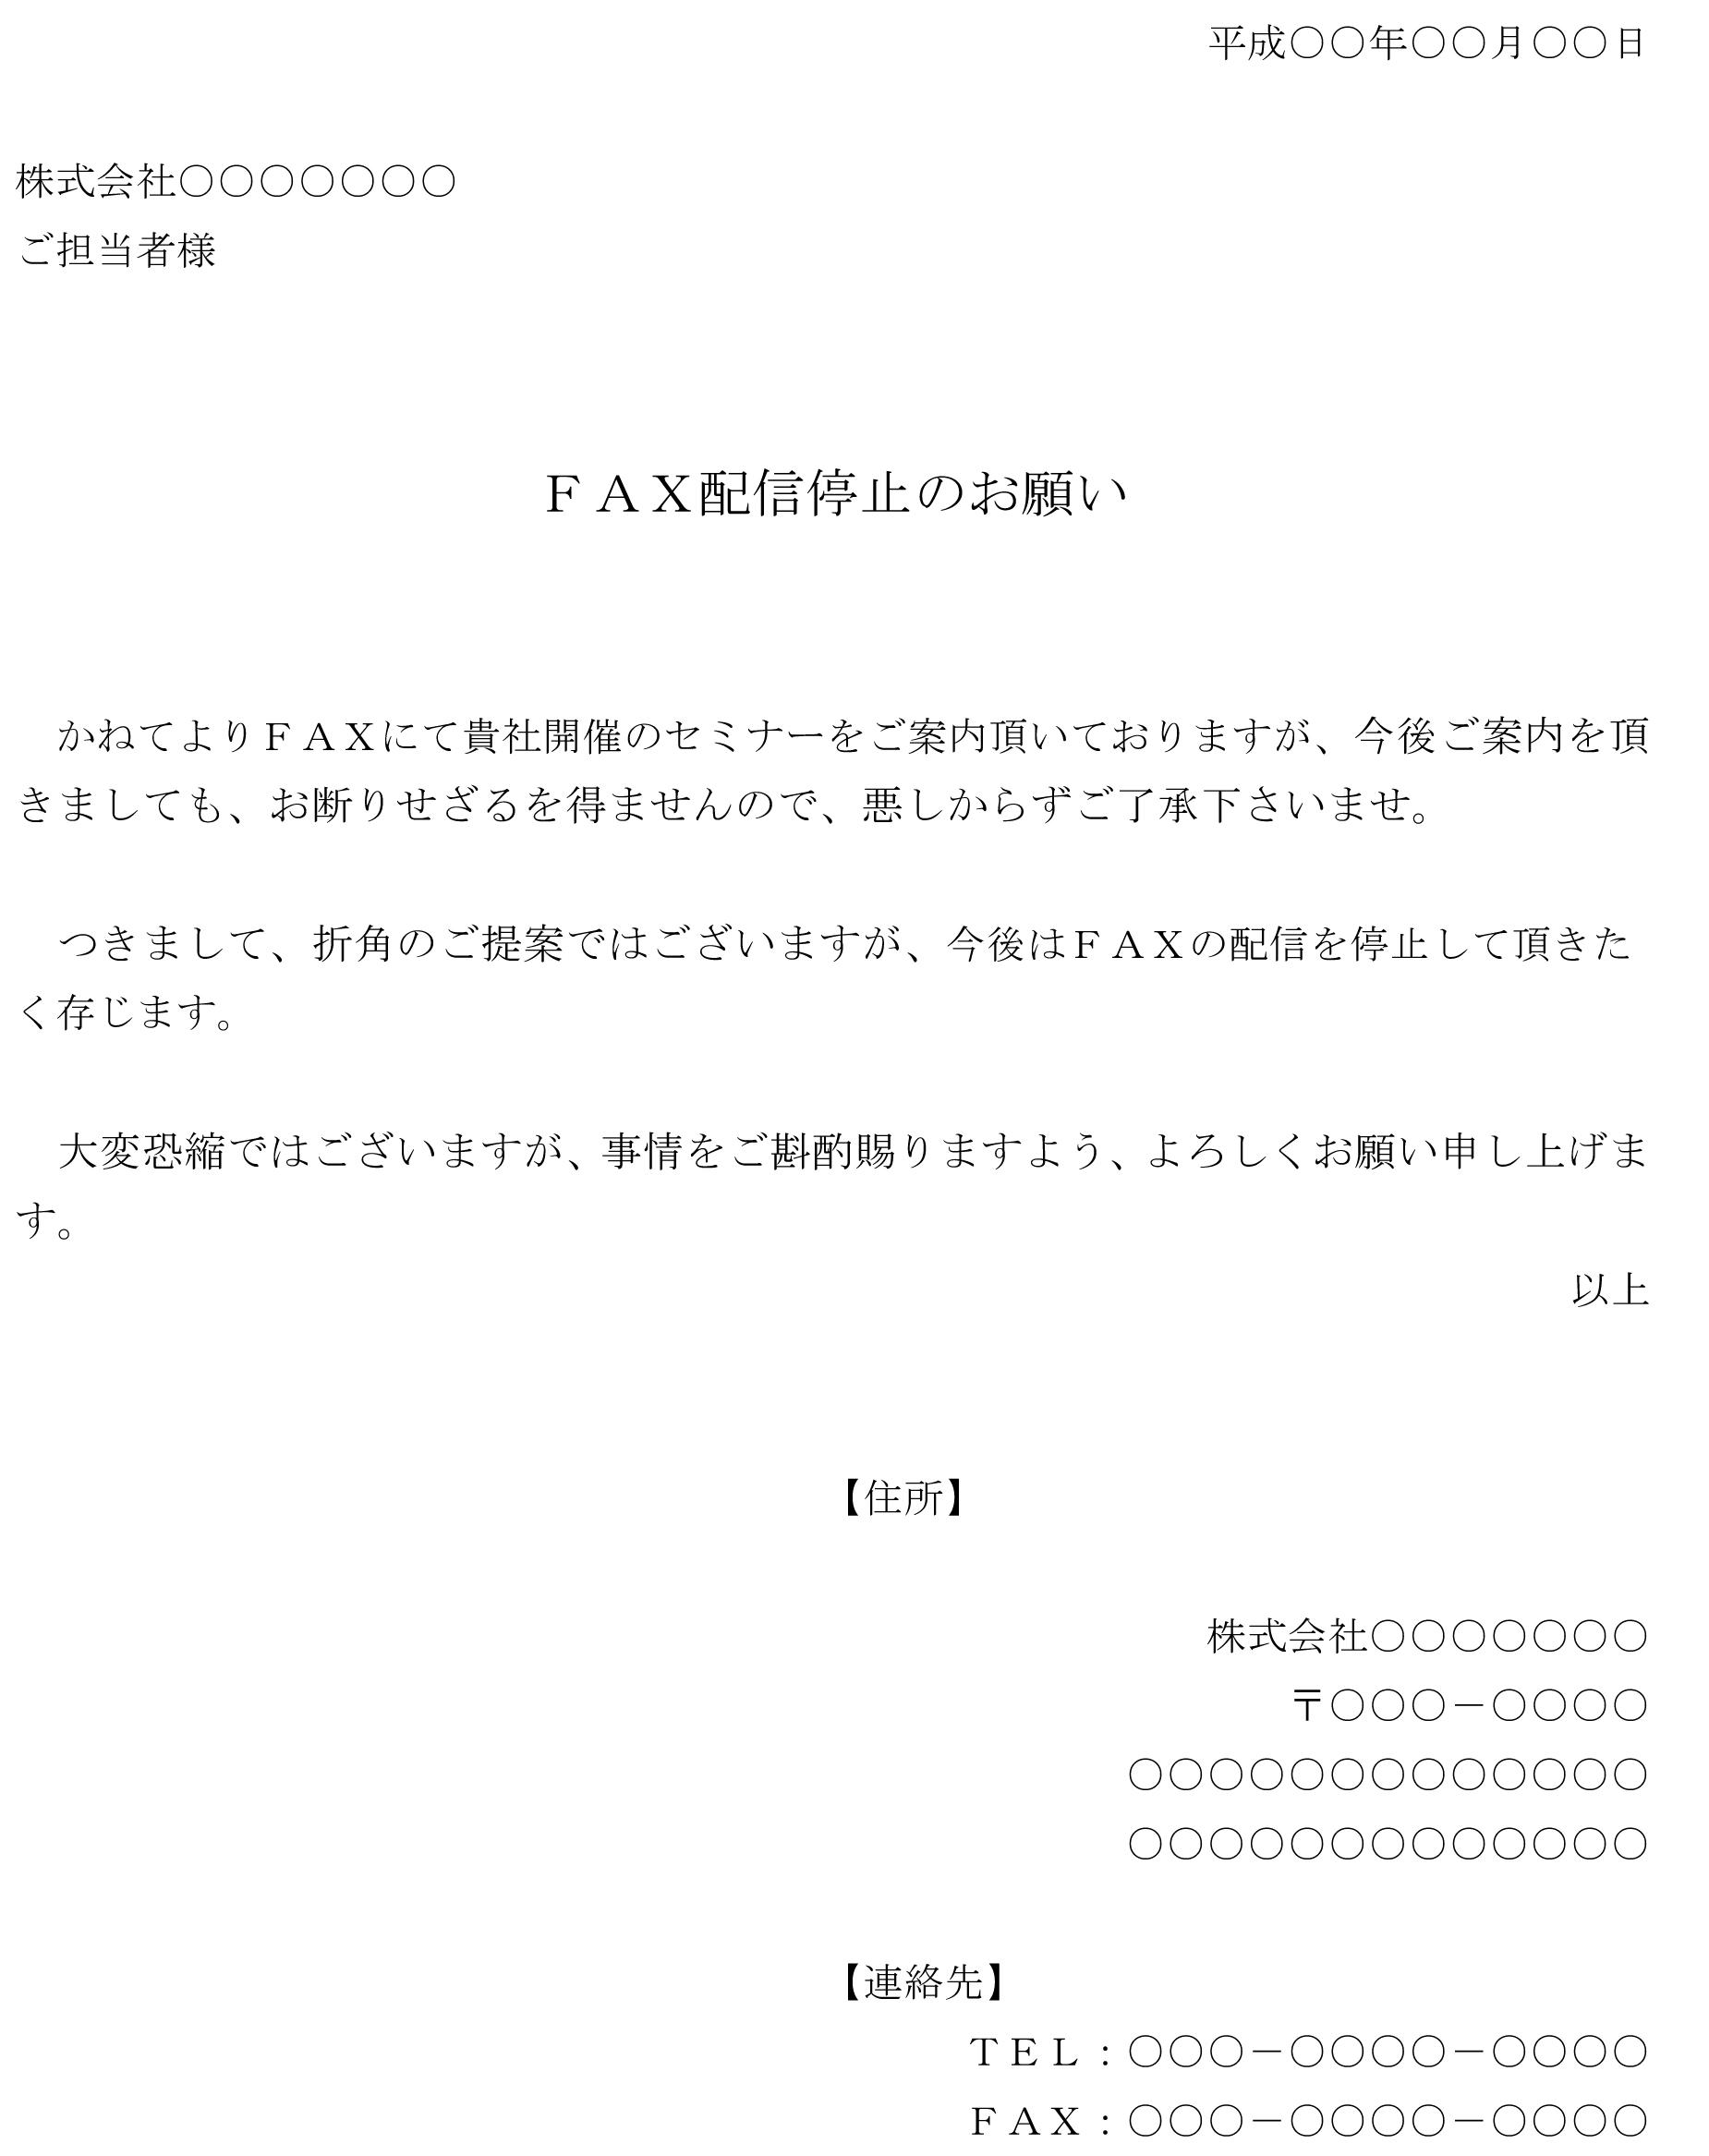 断り状(FAX配信停止)05